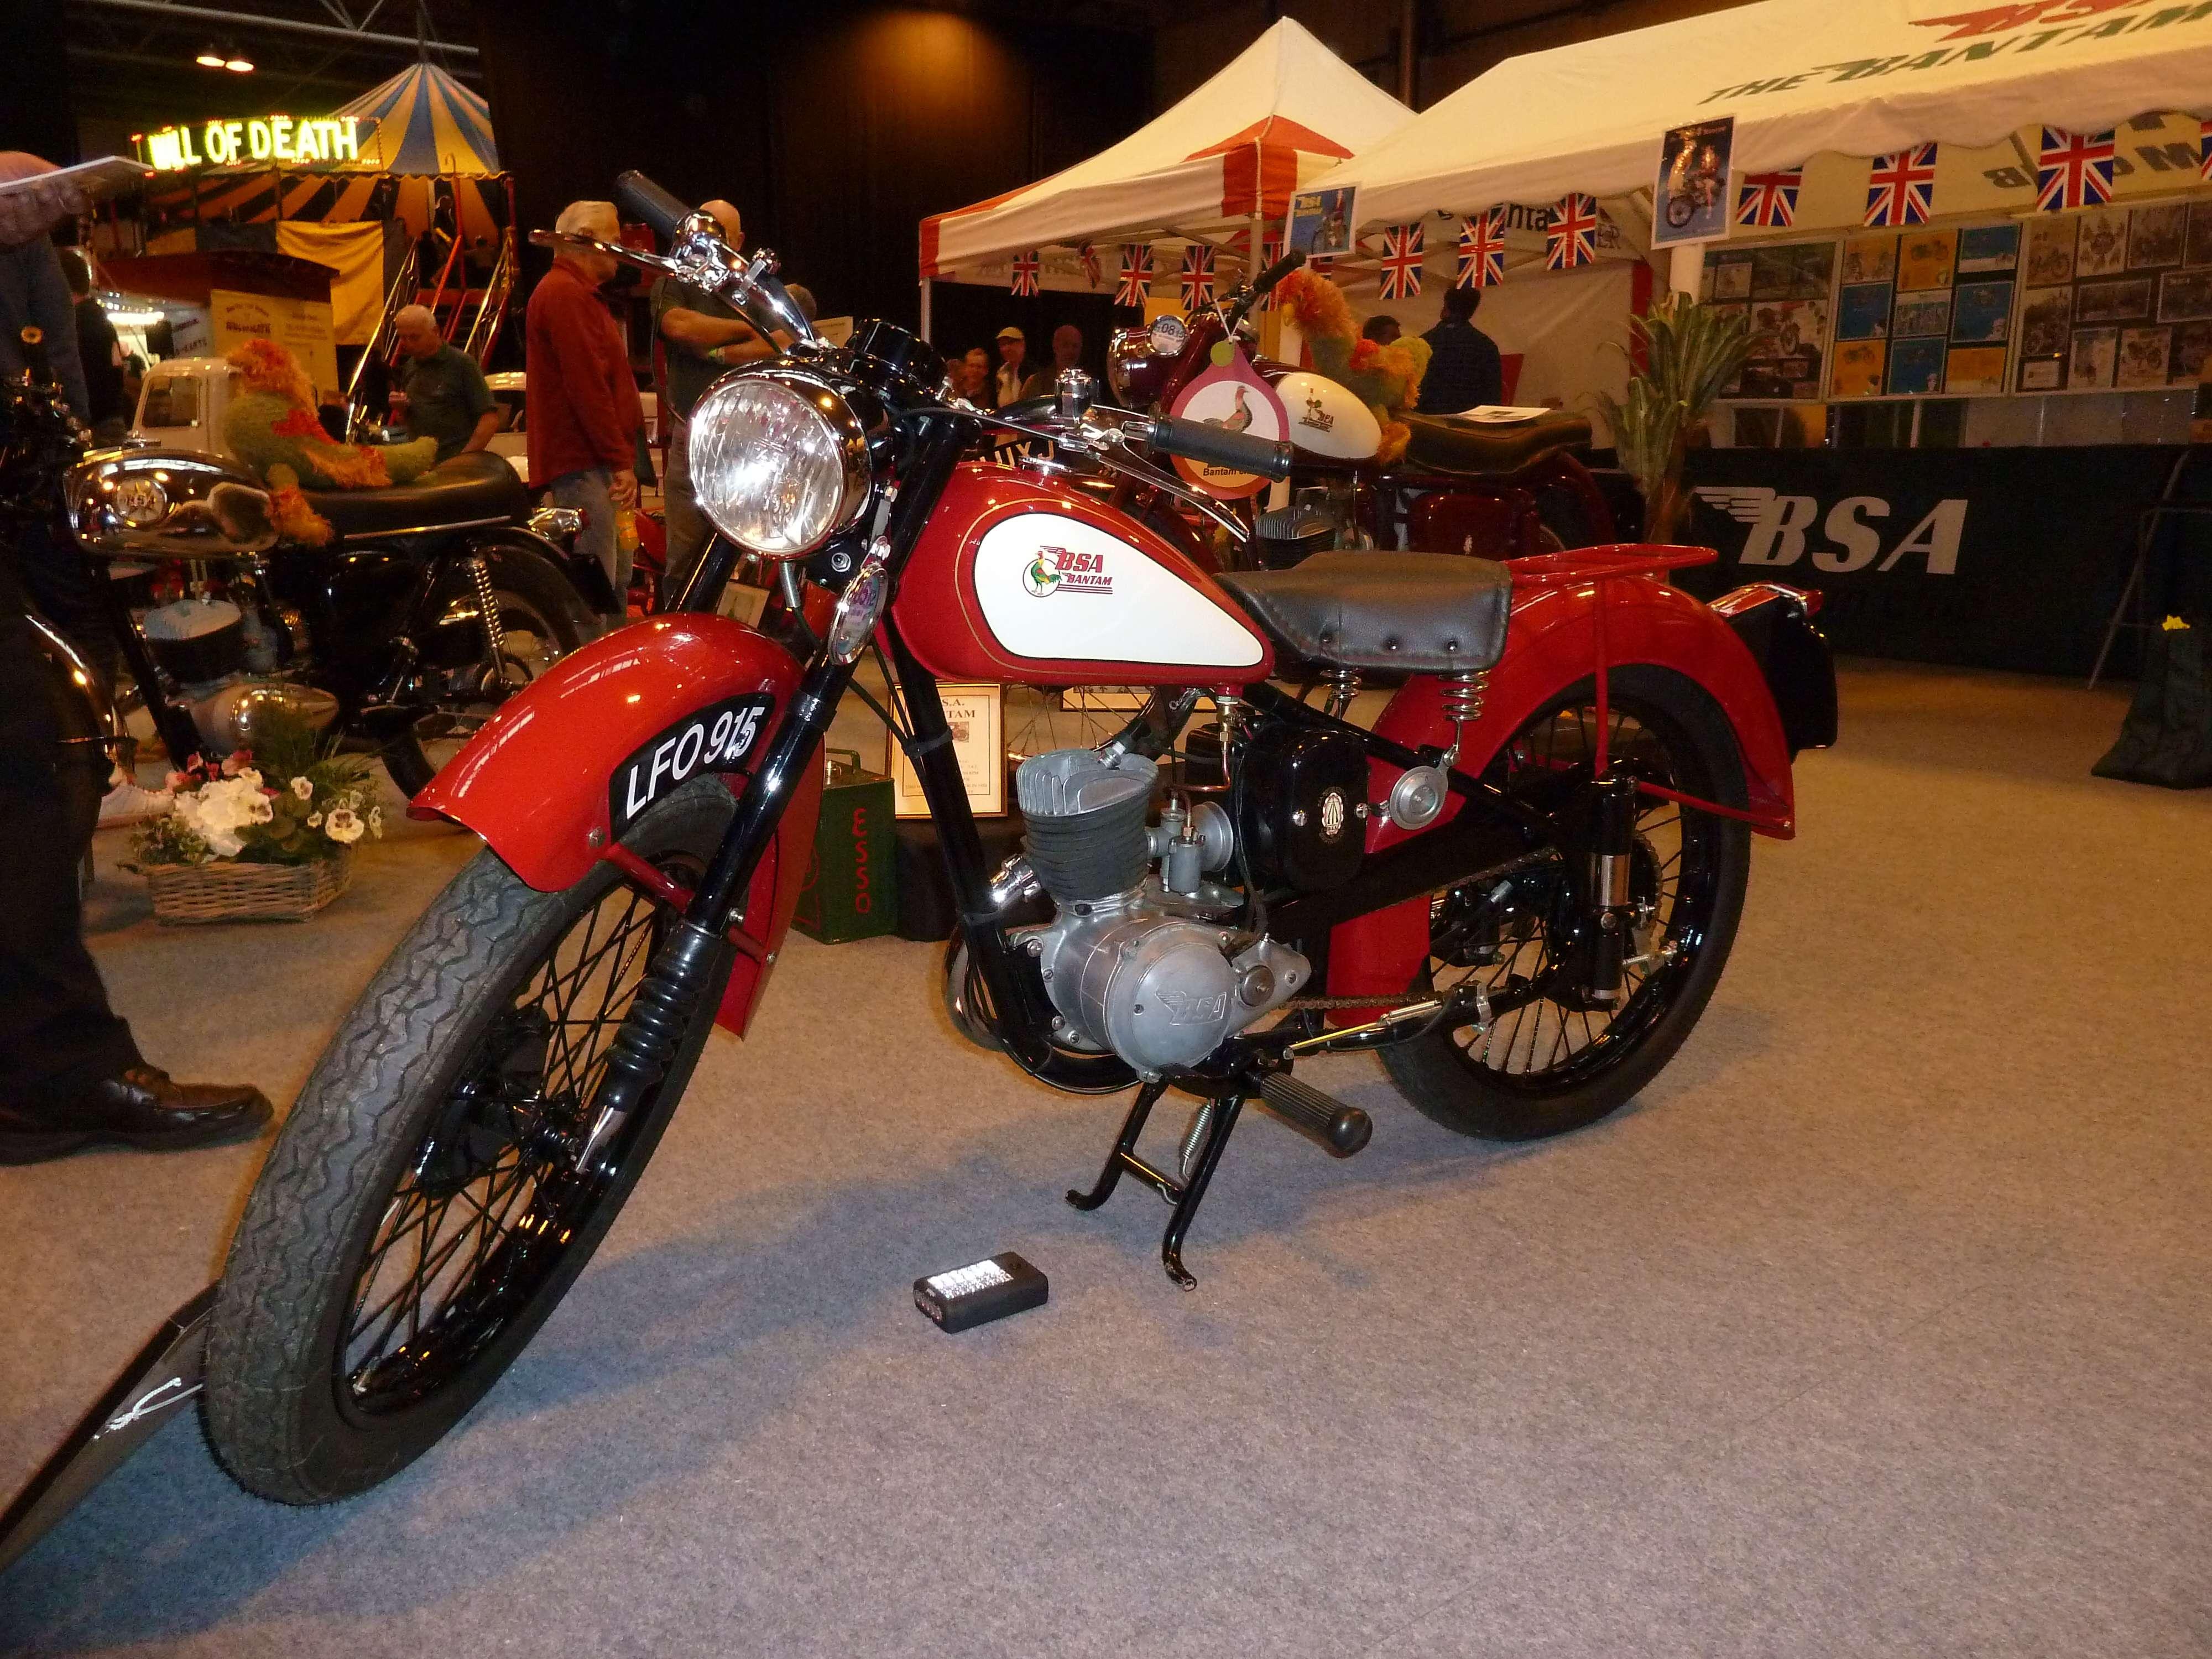 Nec classic motor show 14 16 november 39 14 west mids for All ride motors norfolk va